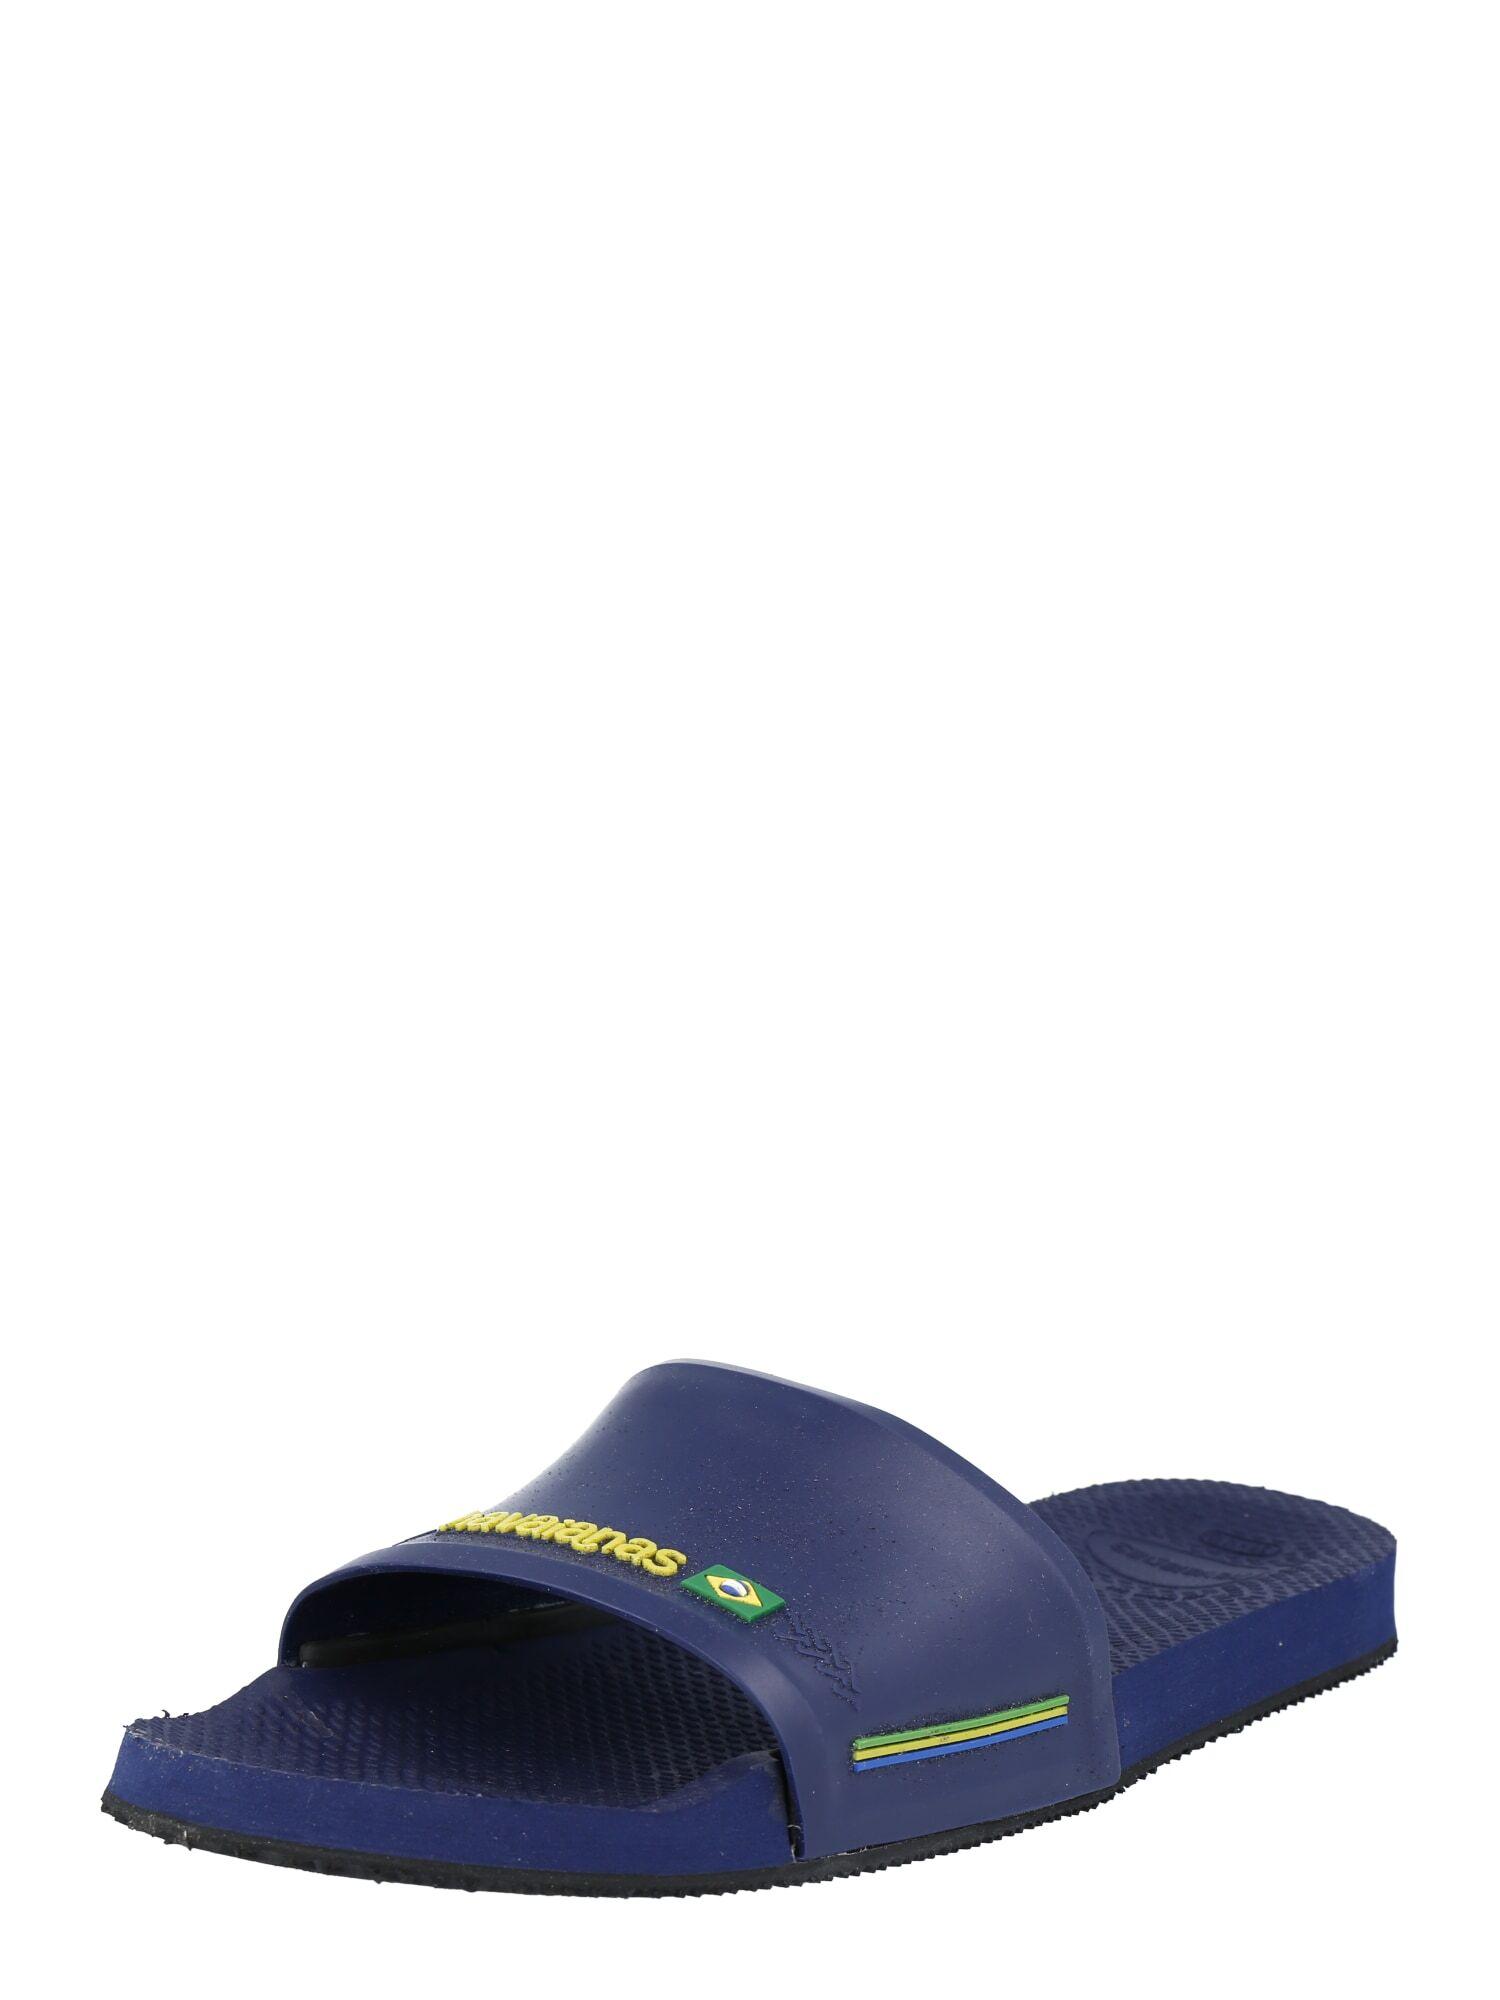 HAVAIANAS Mule 'Slide Brasil'  - Bleu - Taille: 37-38 - male